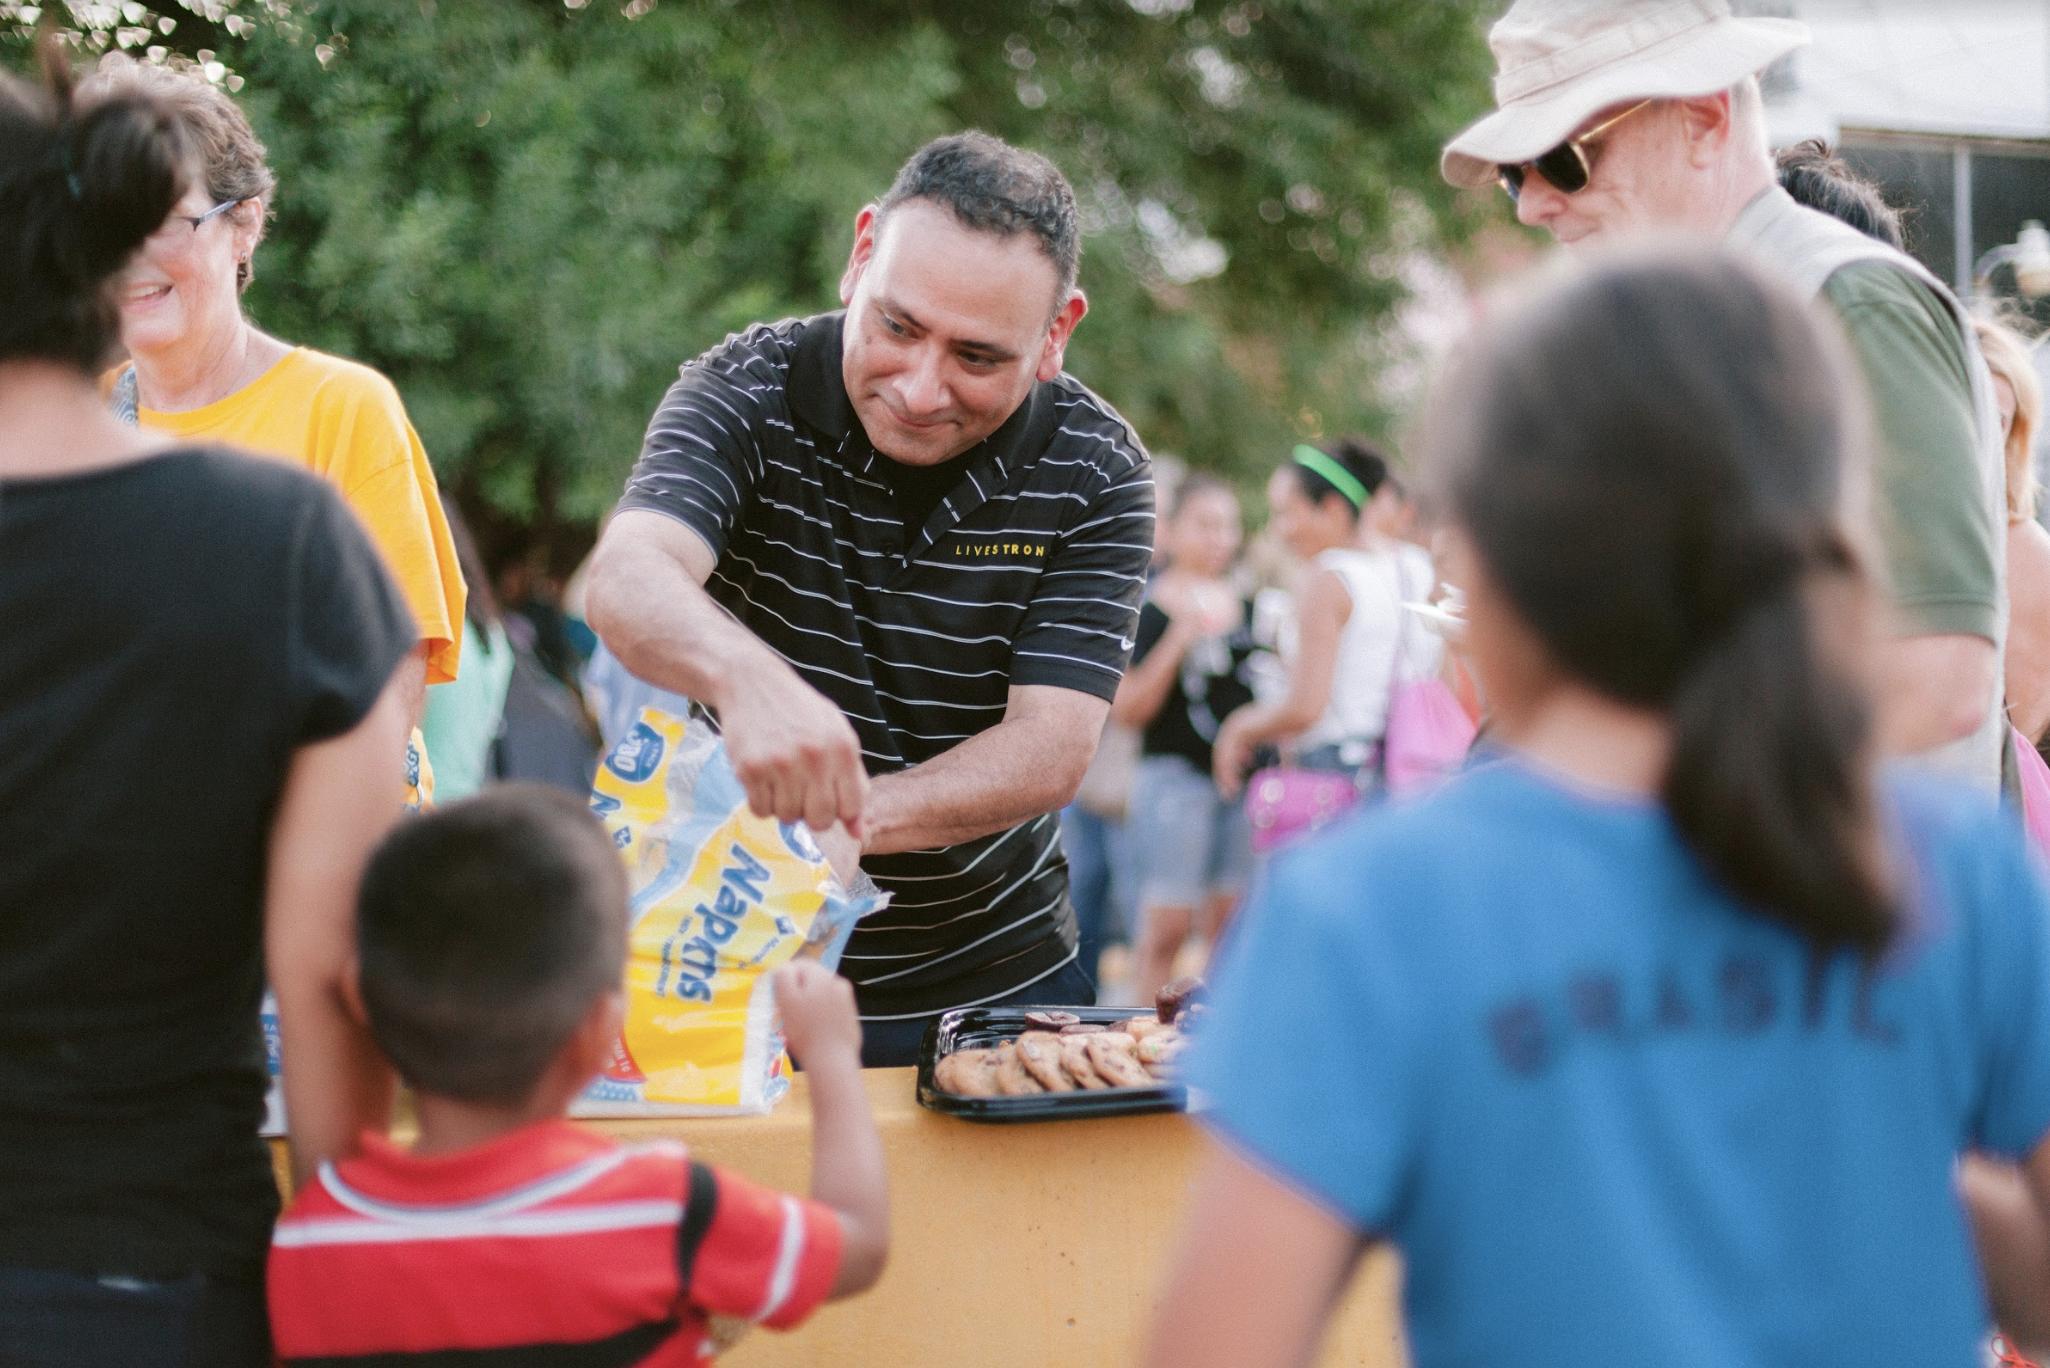 man distributing napkins for community picnic